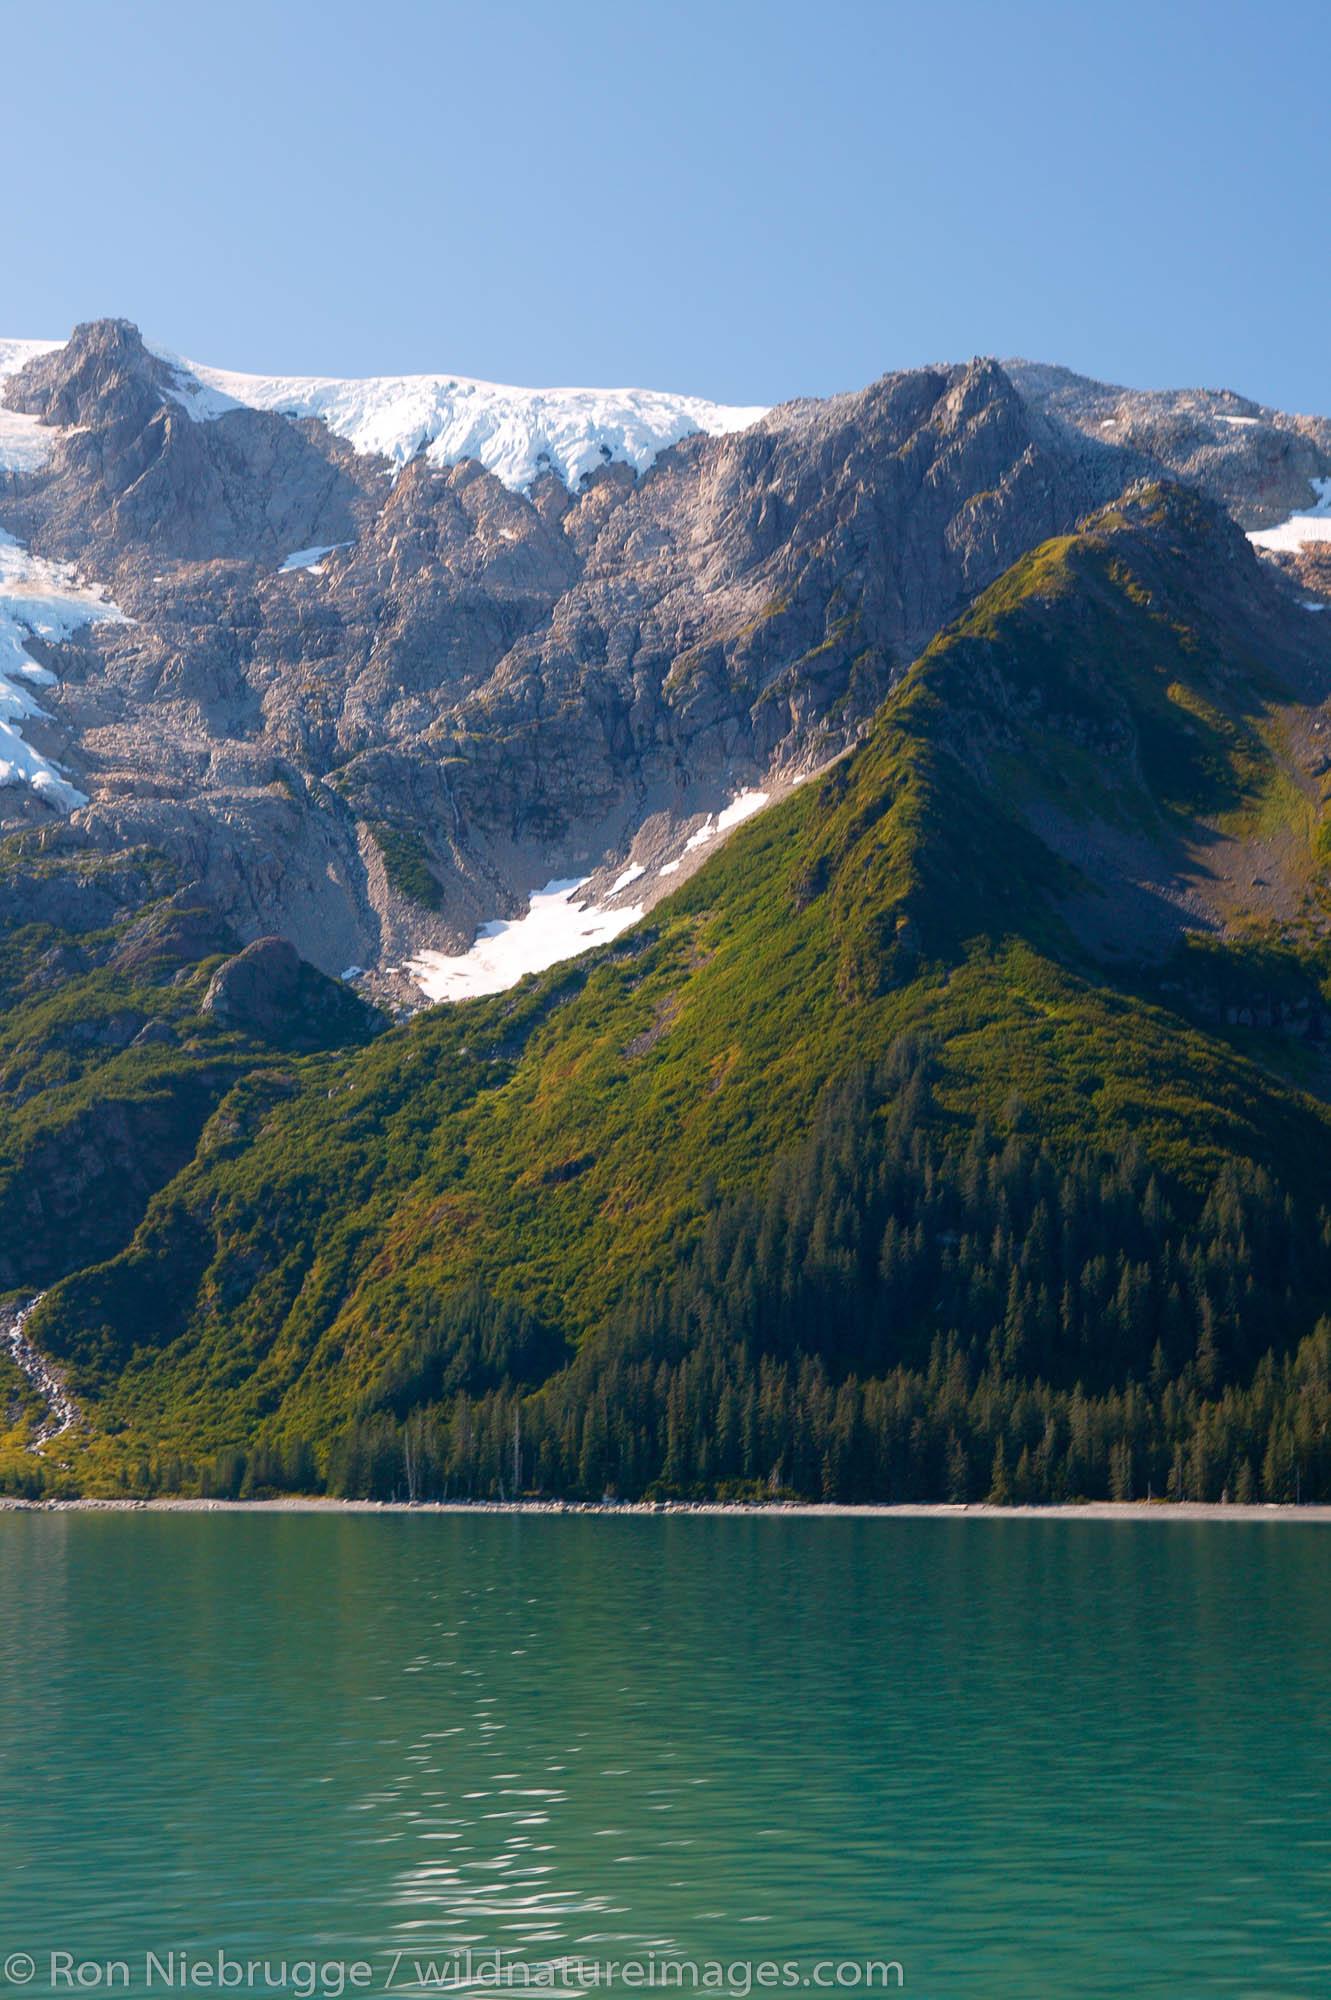 Plant succession along the shores of Holgate Arm, Aialik Bay, Kenai Fjords National Park, Alaska.